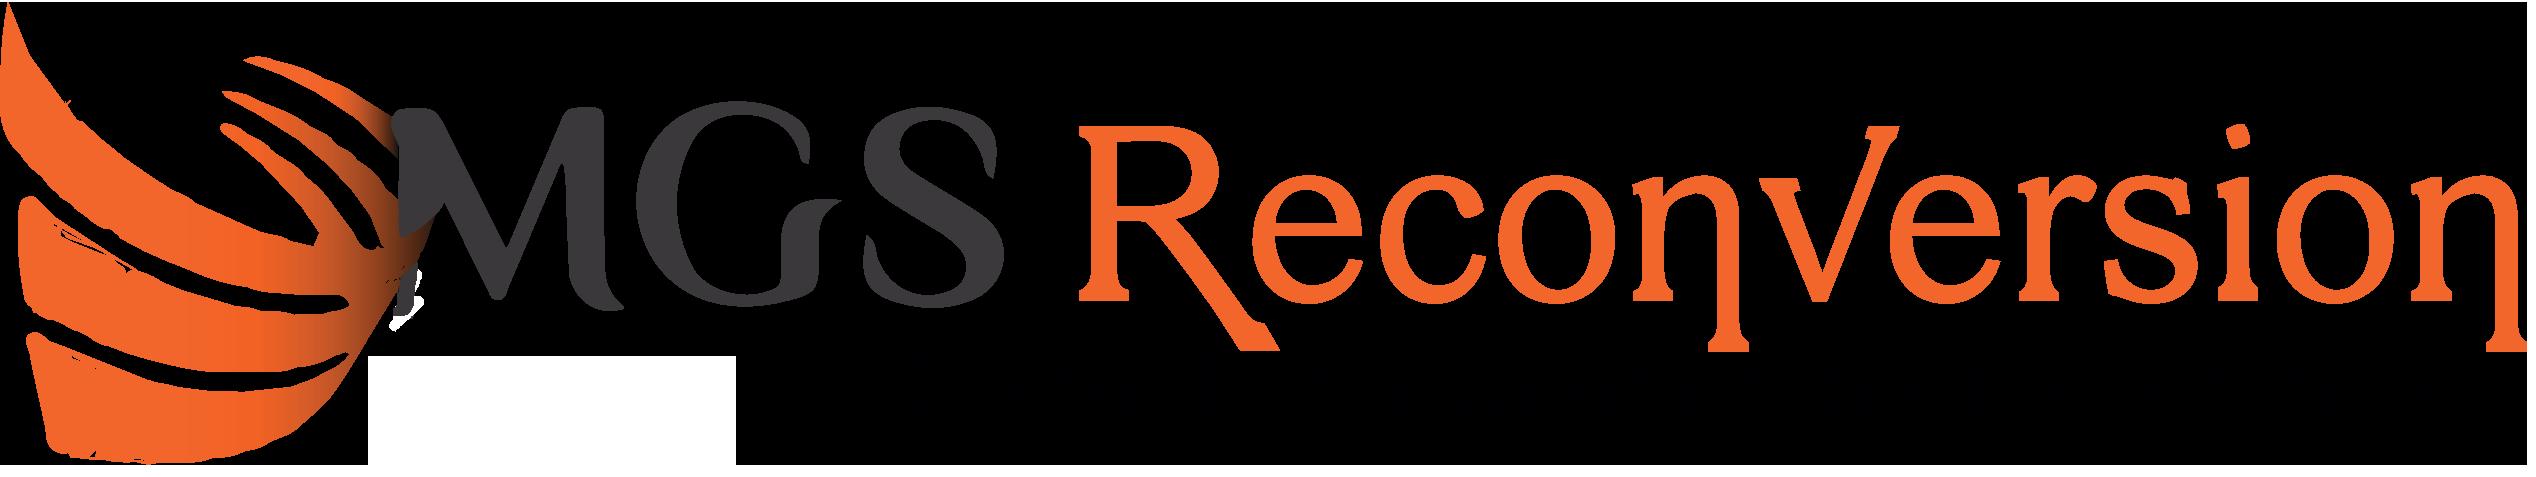 MGS-Reconversion